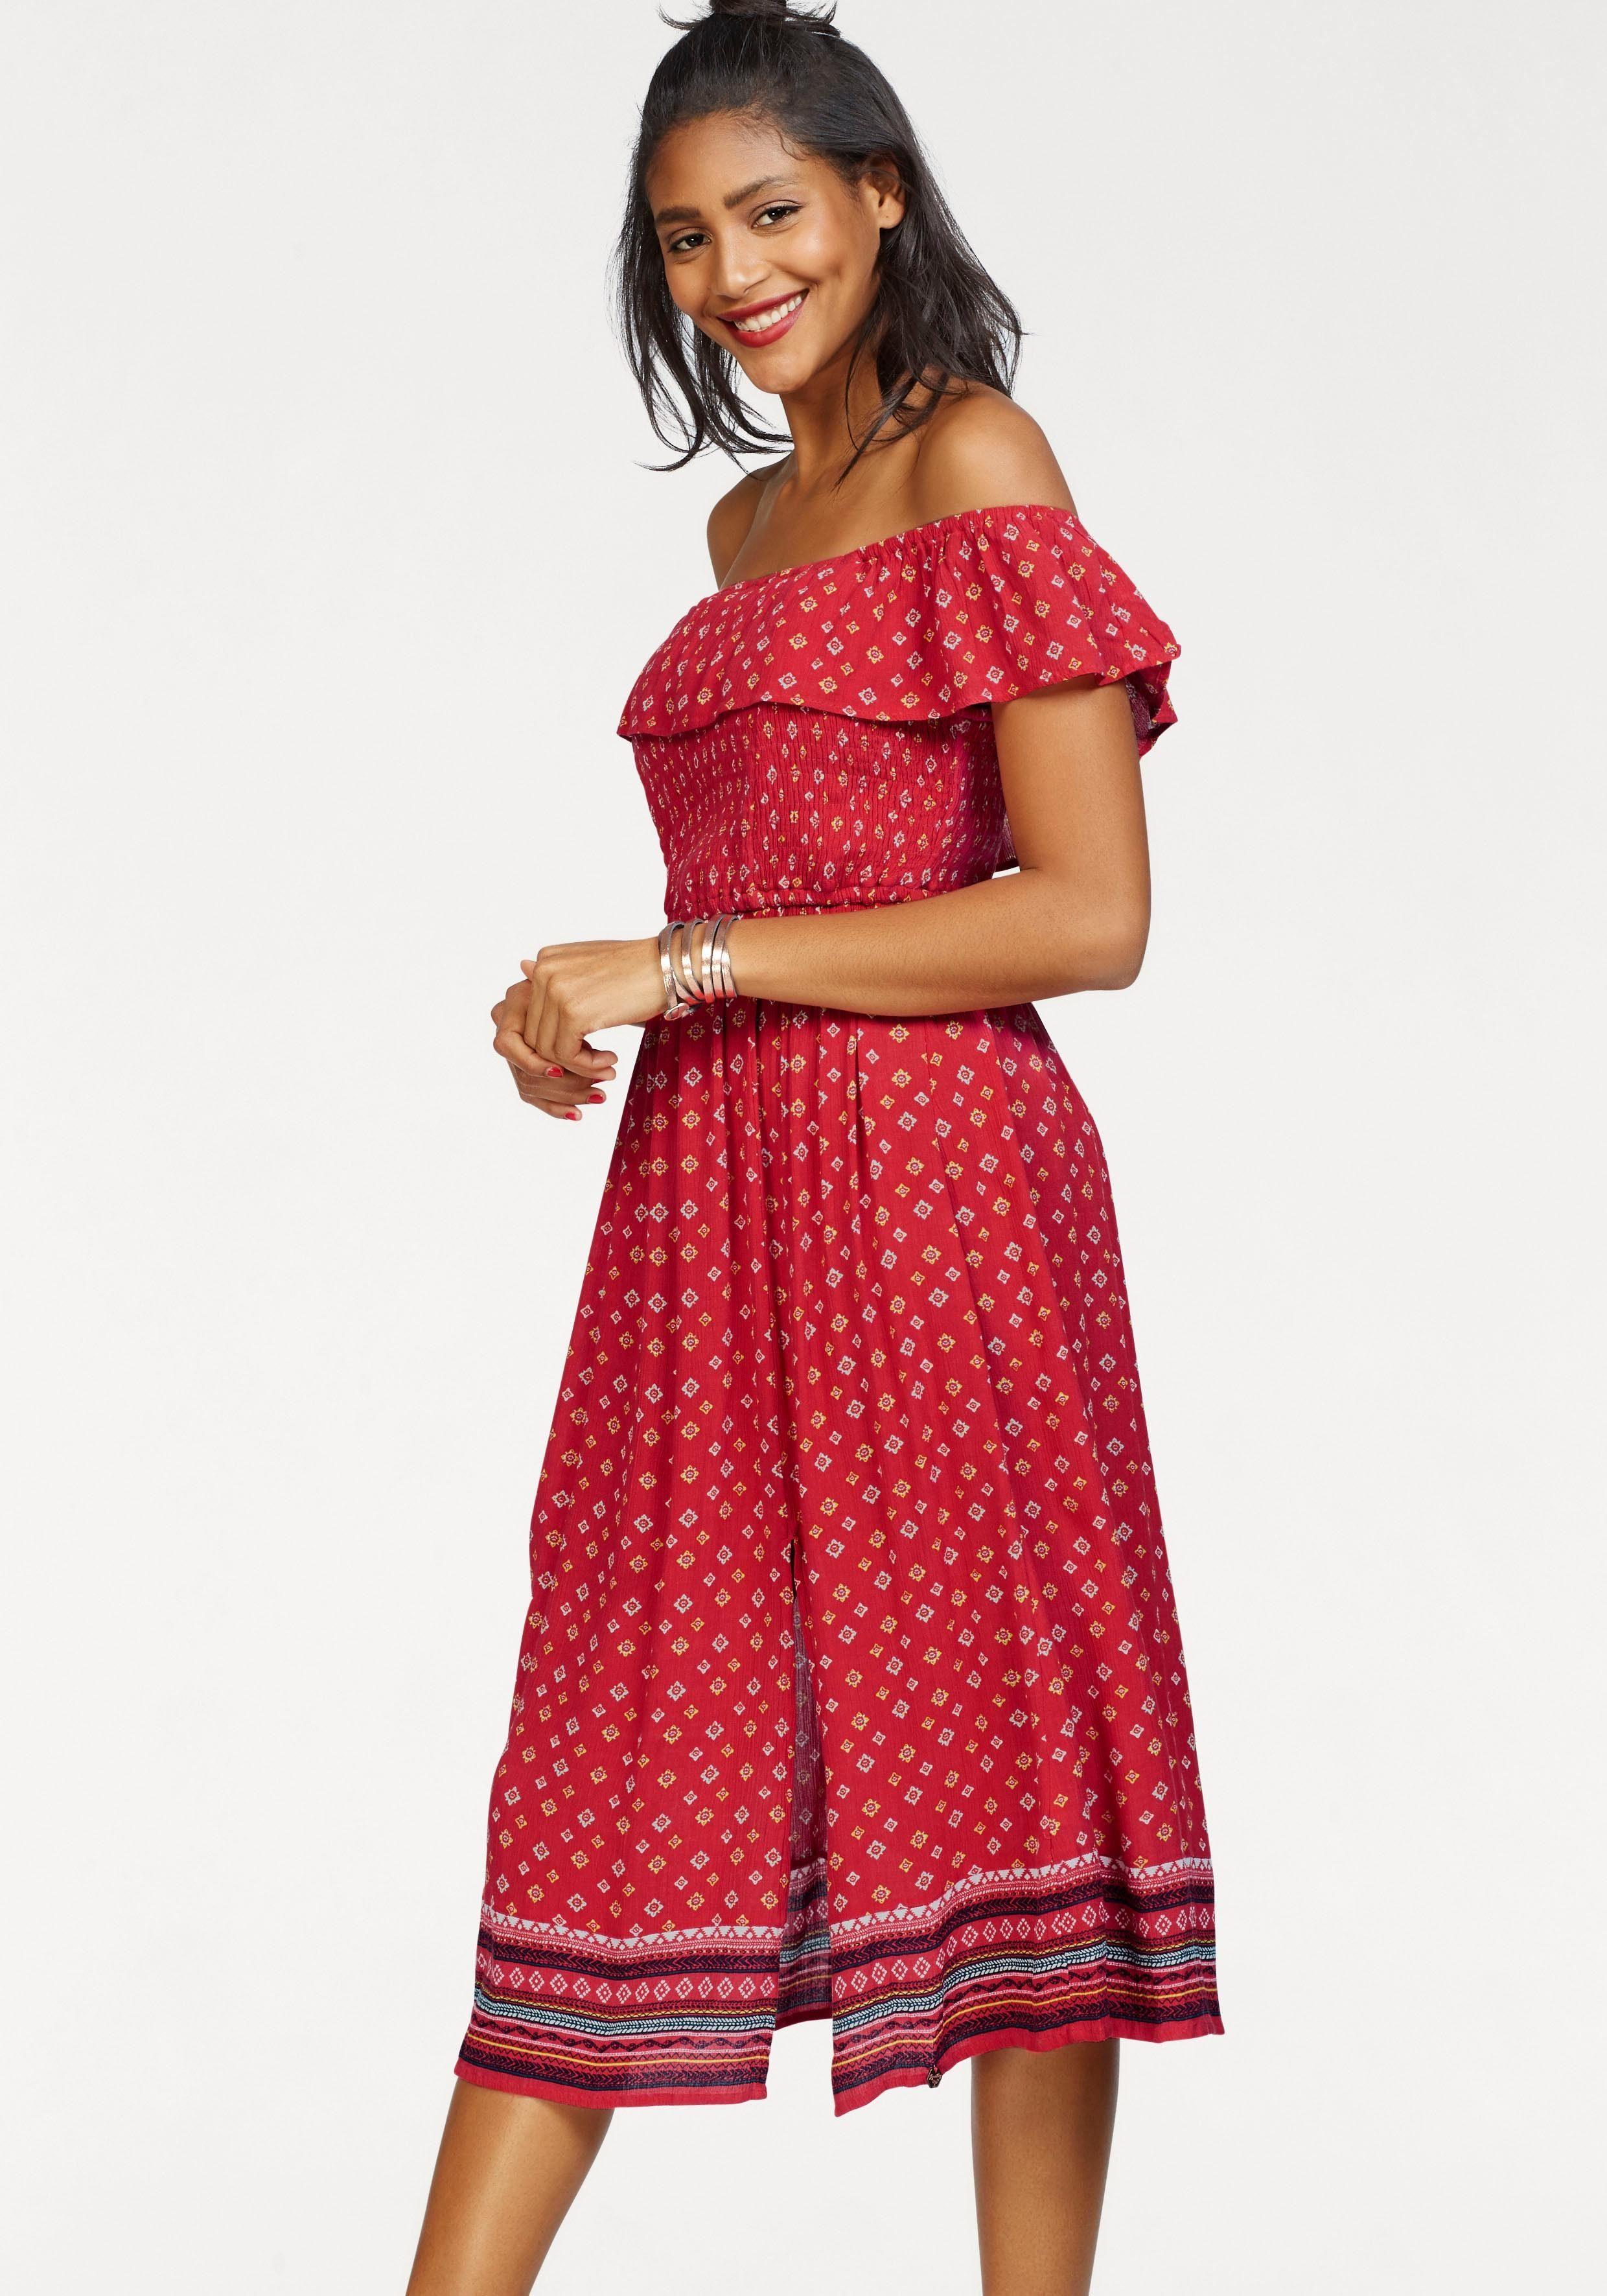 Smocked Look »ruffle Shoulder Ethno Online KaufenOtto Im Kleid Off Superdry Dress« sxBdrthQC